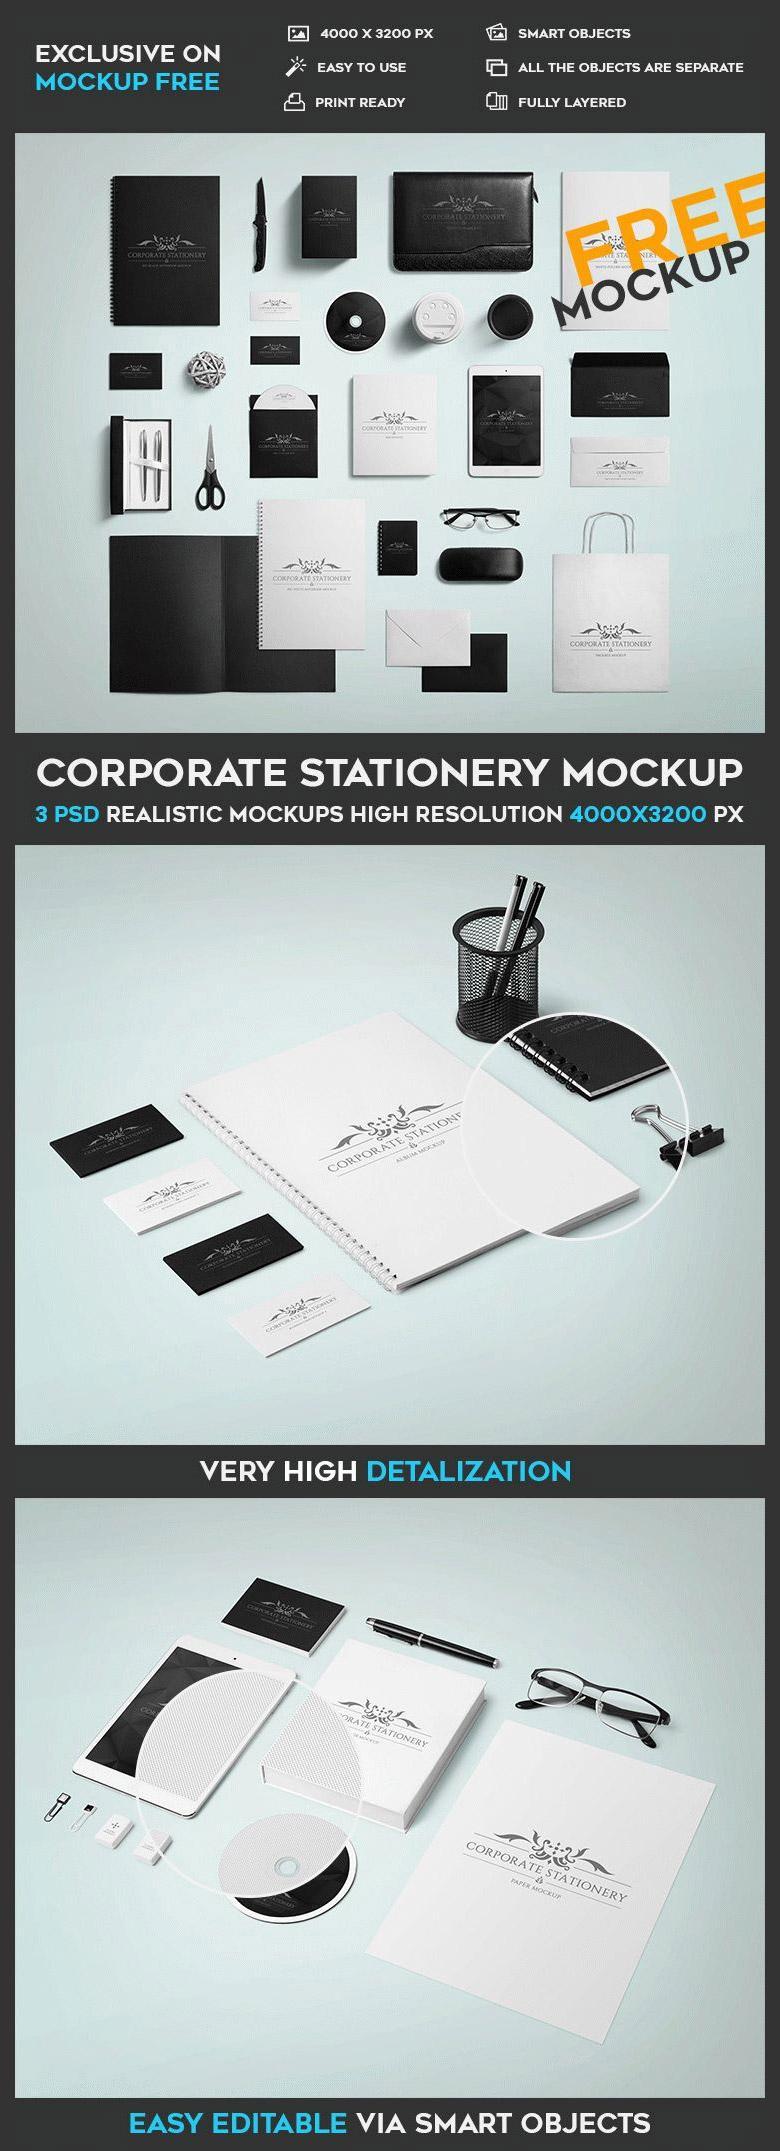 Corporate Stationery Mockup Set